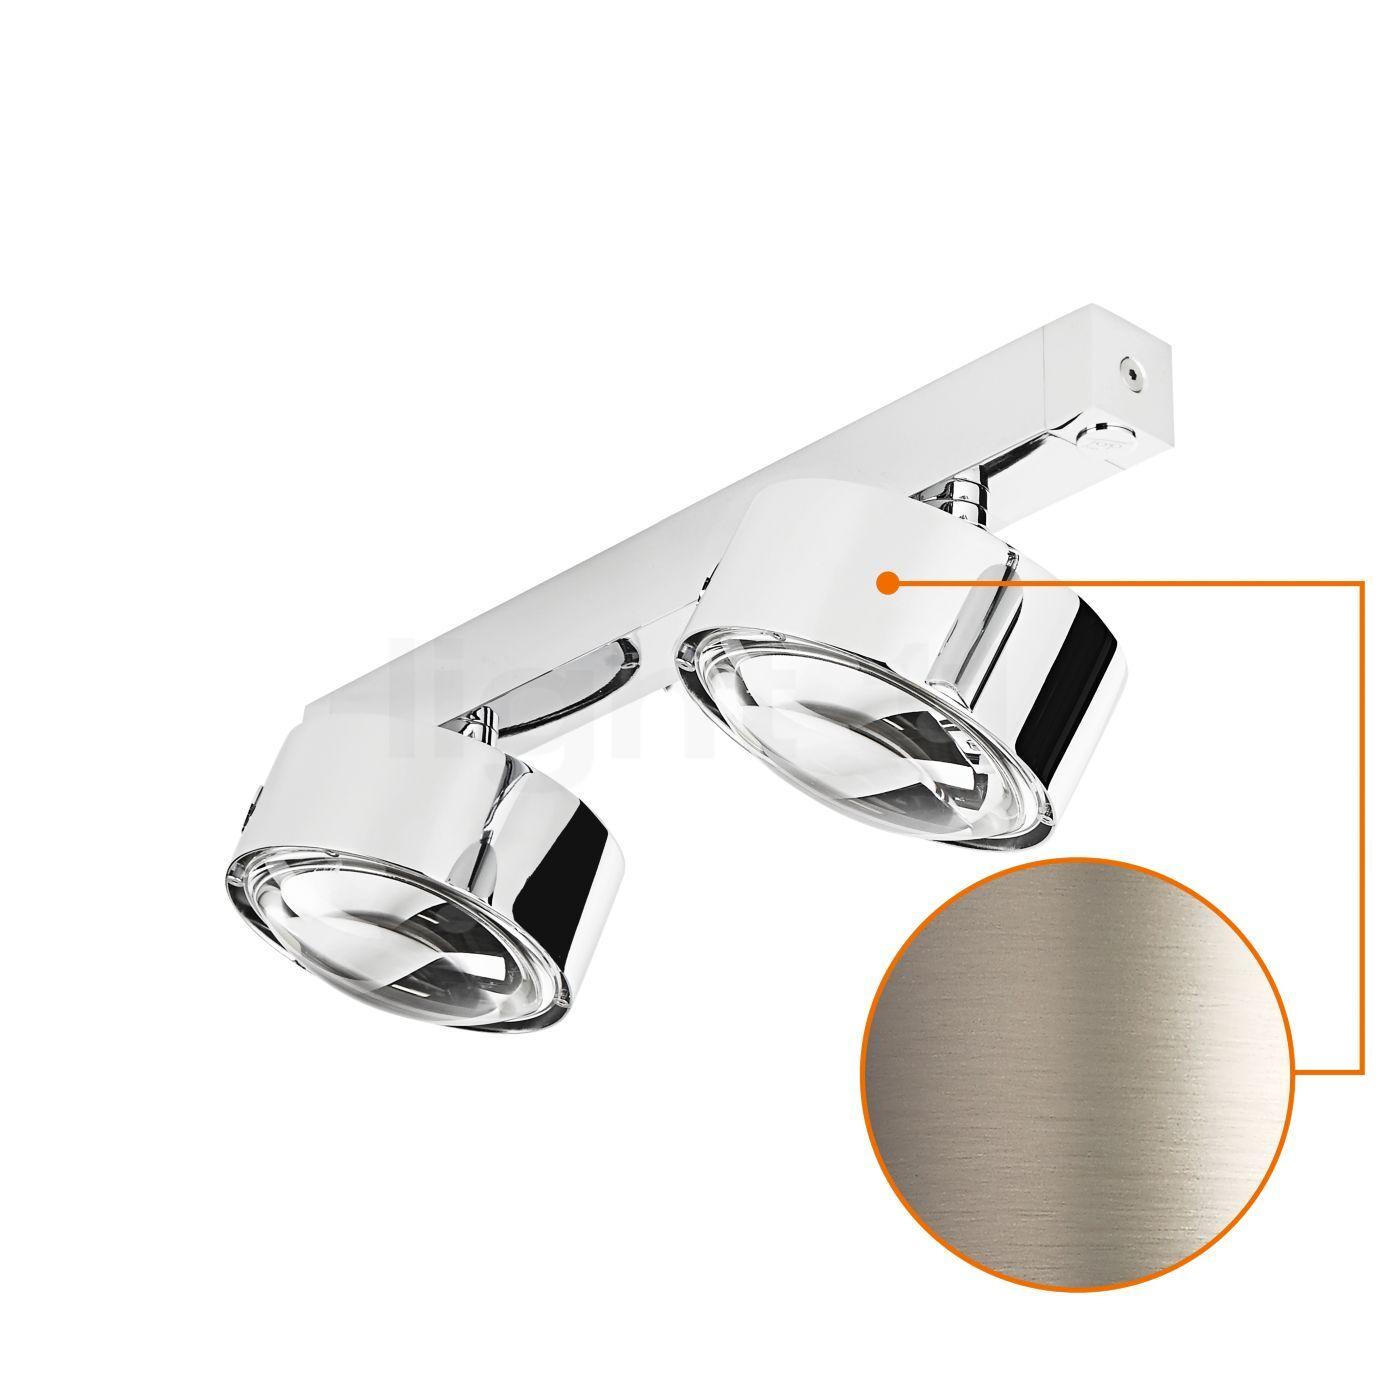 Top Light Puk Maxx Choice Move 35 cm Applique/Plafonnier, nickel mat/lentille mat